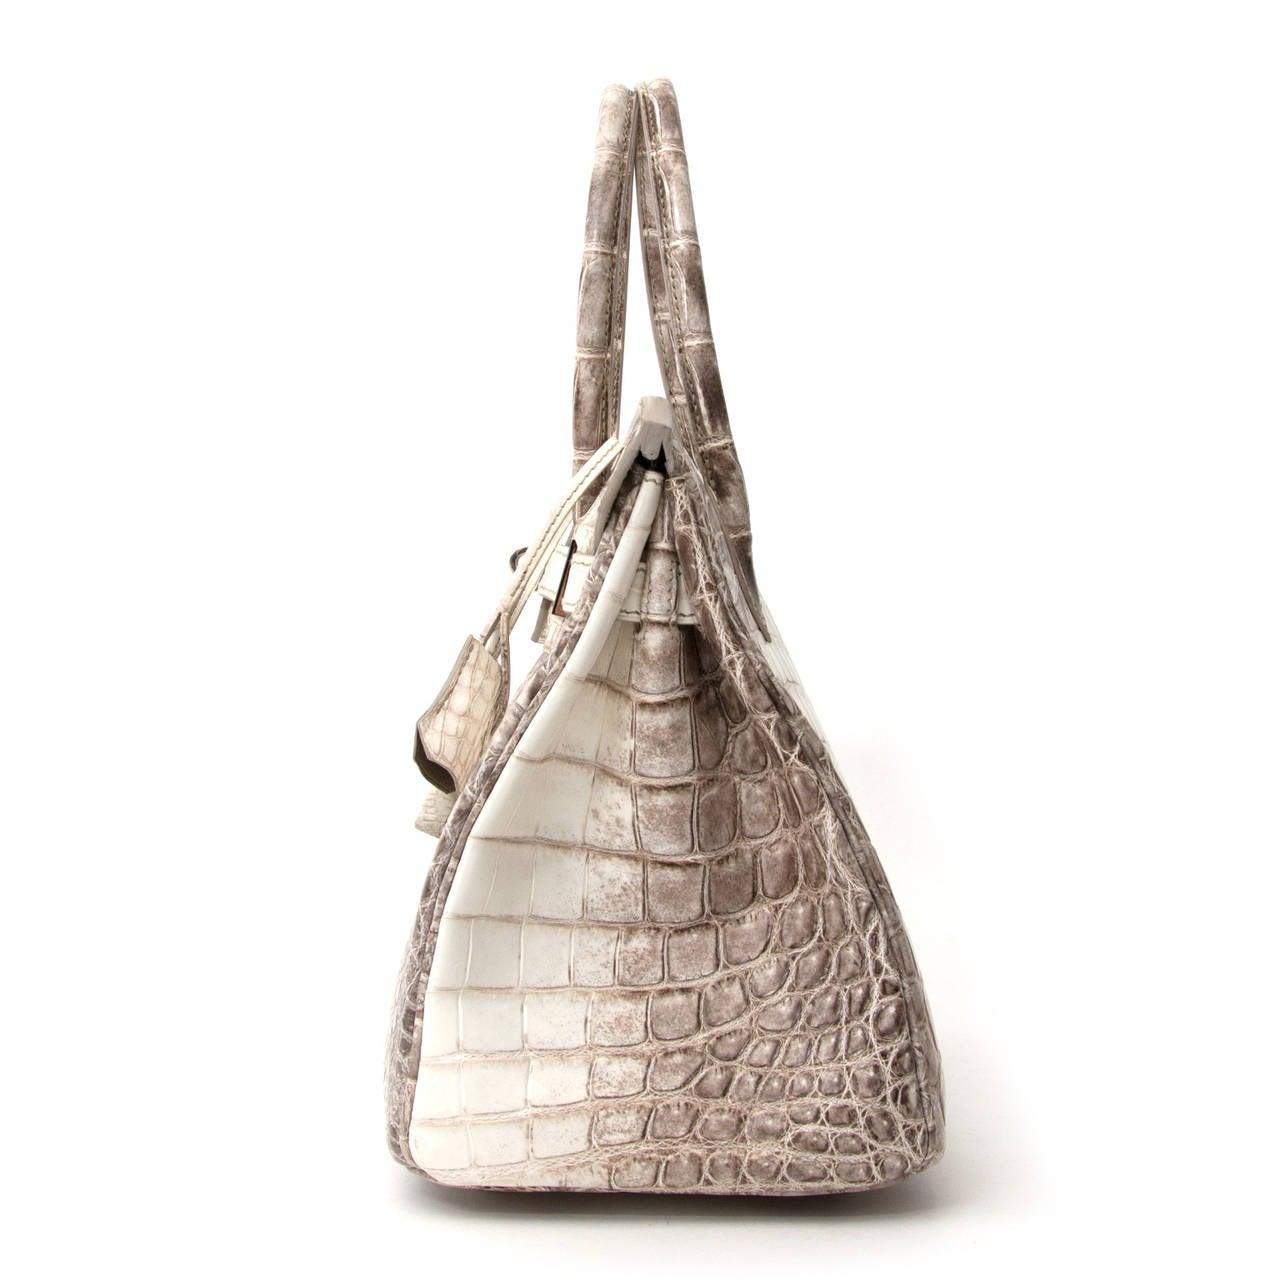 dc5be0e7a5 Beige Hermès Birkin Bag Crocodile Niloticus Himalaya Handbag White PHW 30  For Sale